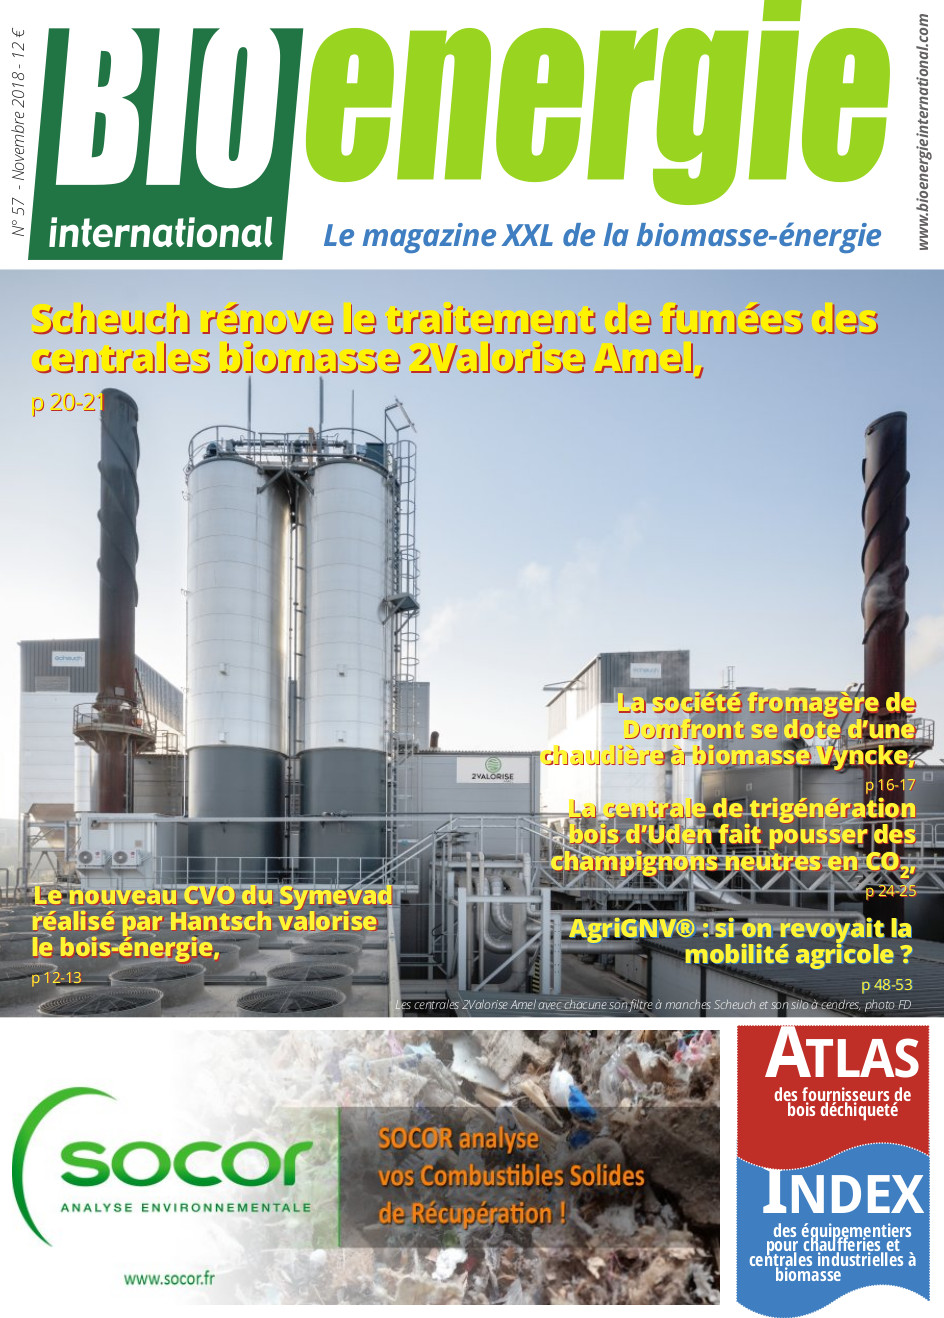 Bioénergie international n°57 – Novembre 2018